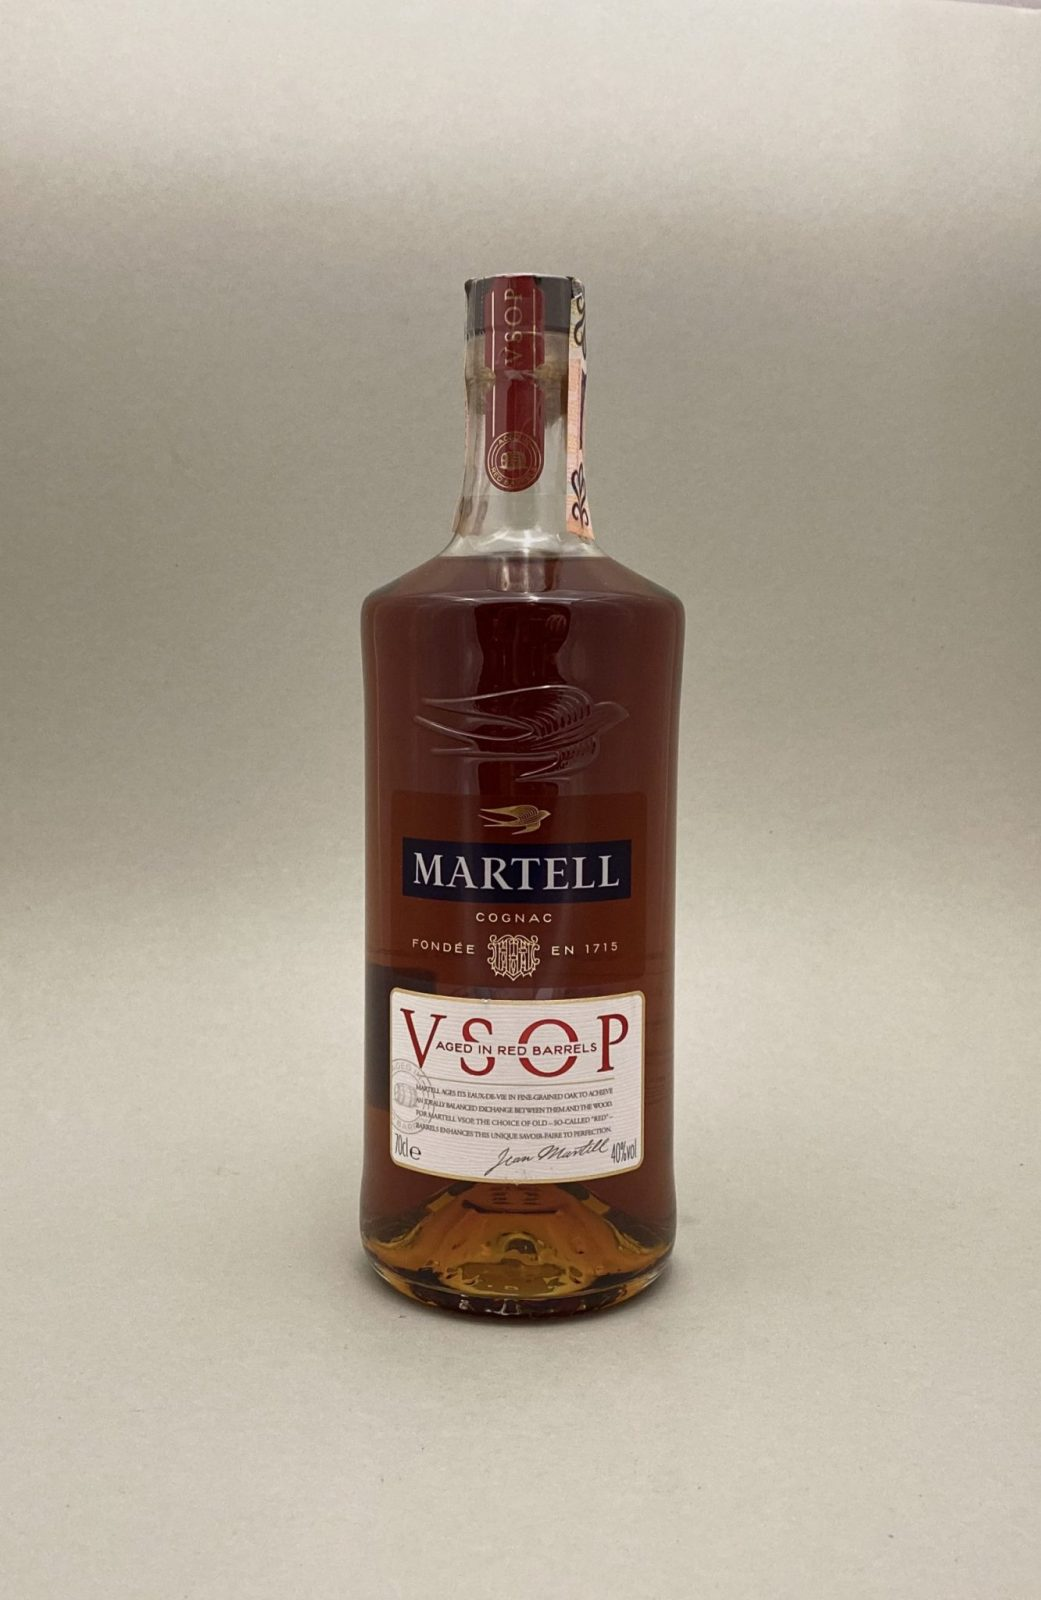 Martell V.S.O.P 40%, Bottleshop Sunny wines slnecnice mesto, petrzalka, koňak, rozvoz alkoholu, eshop